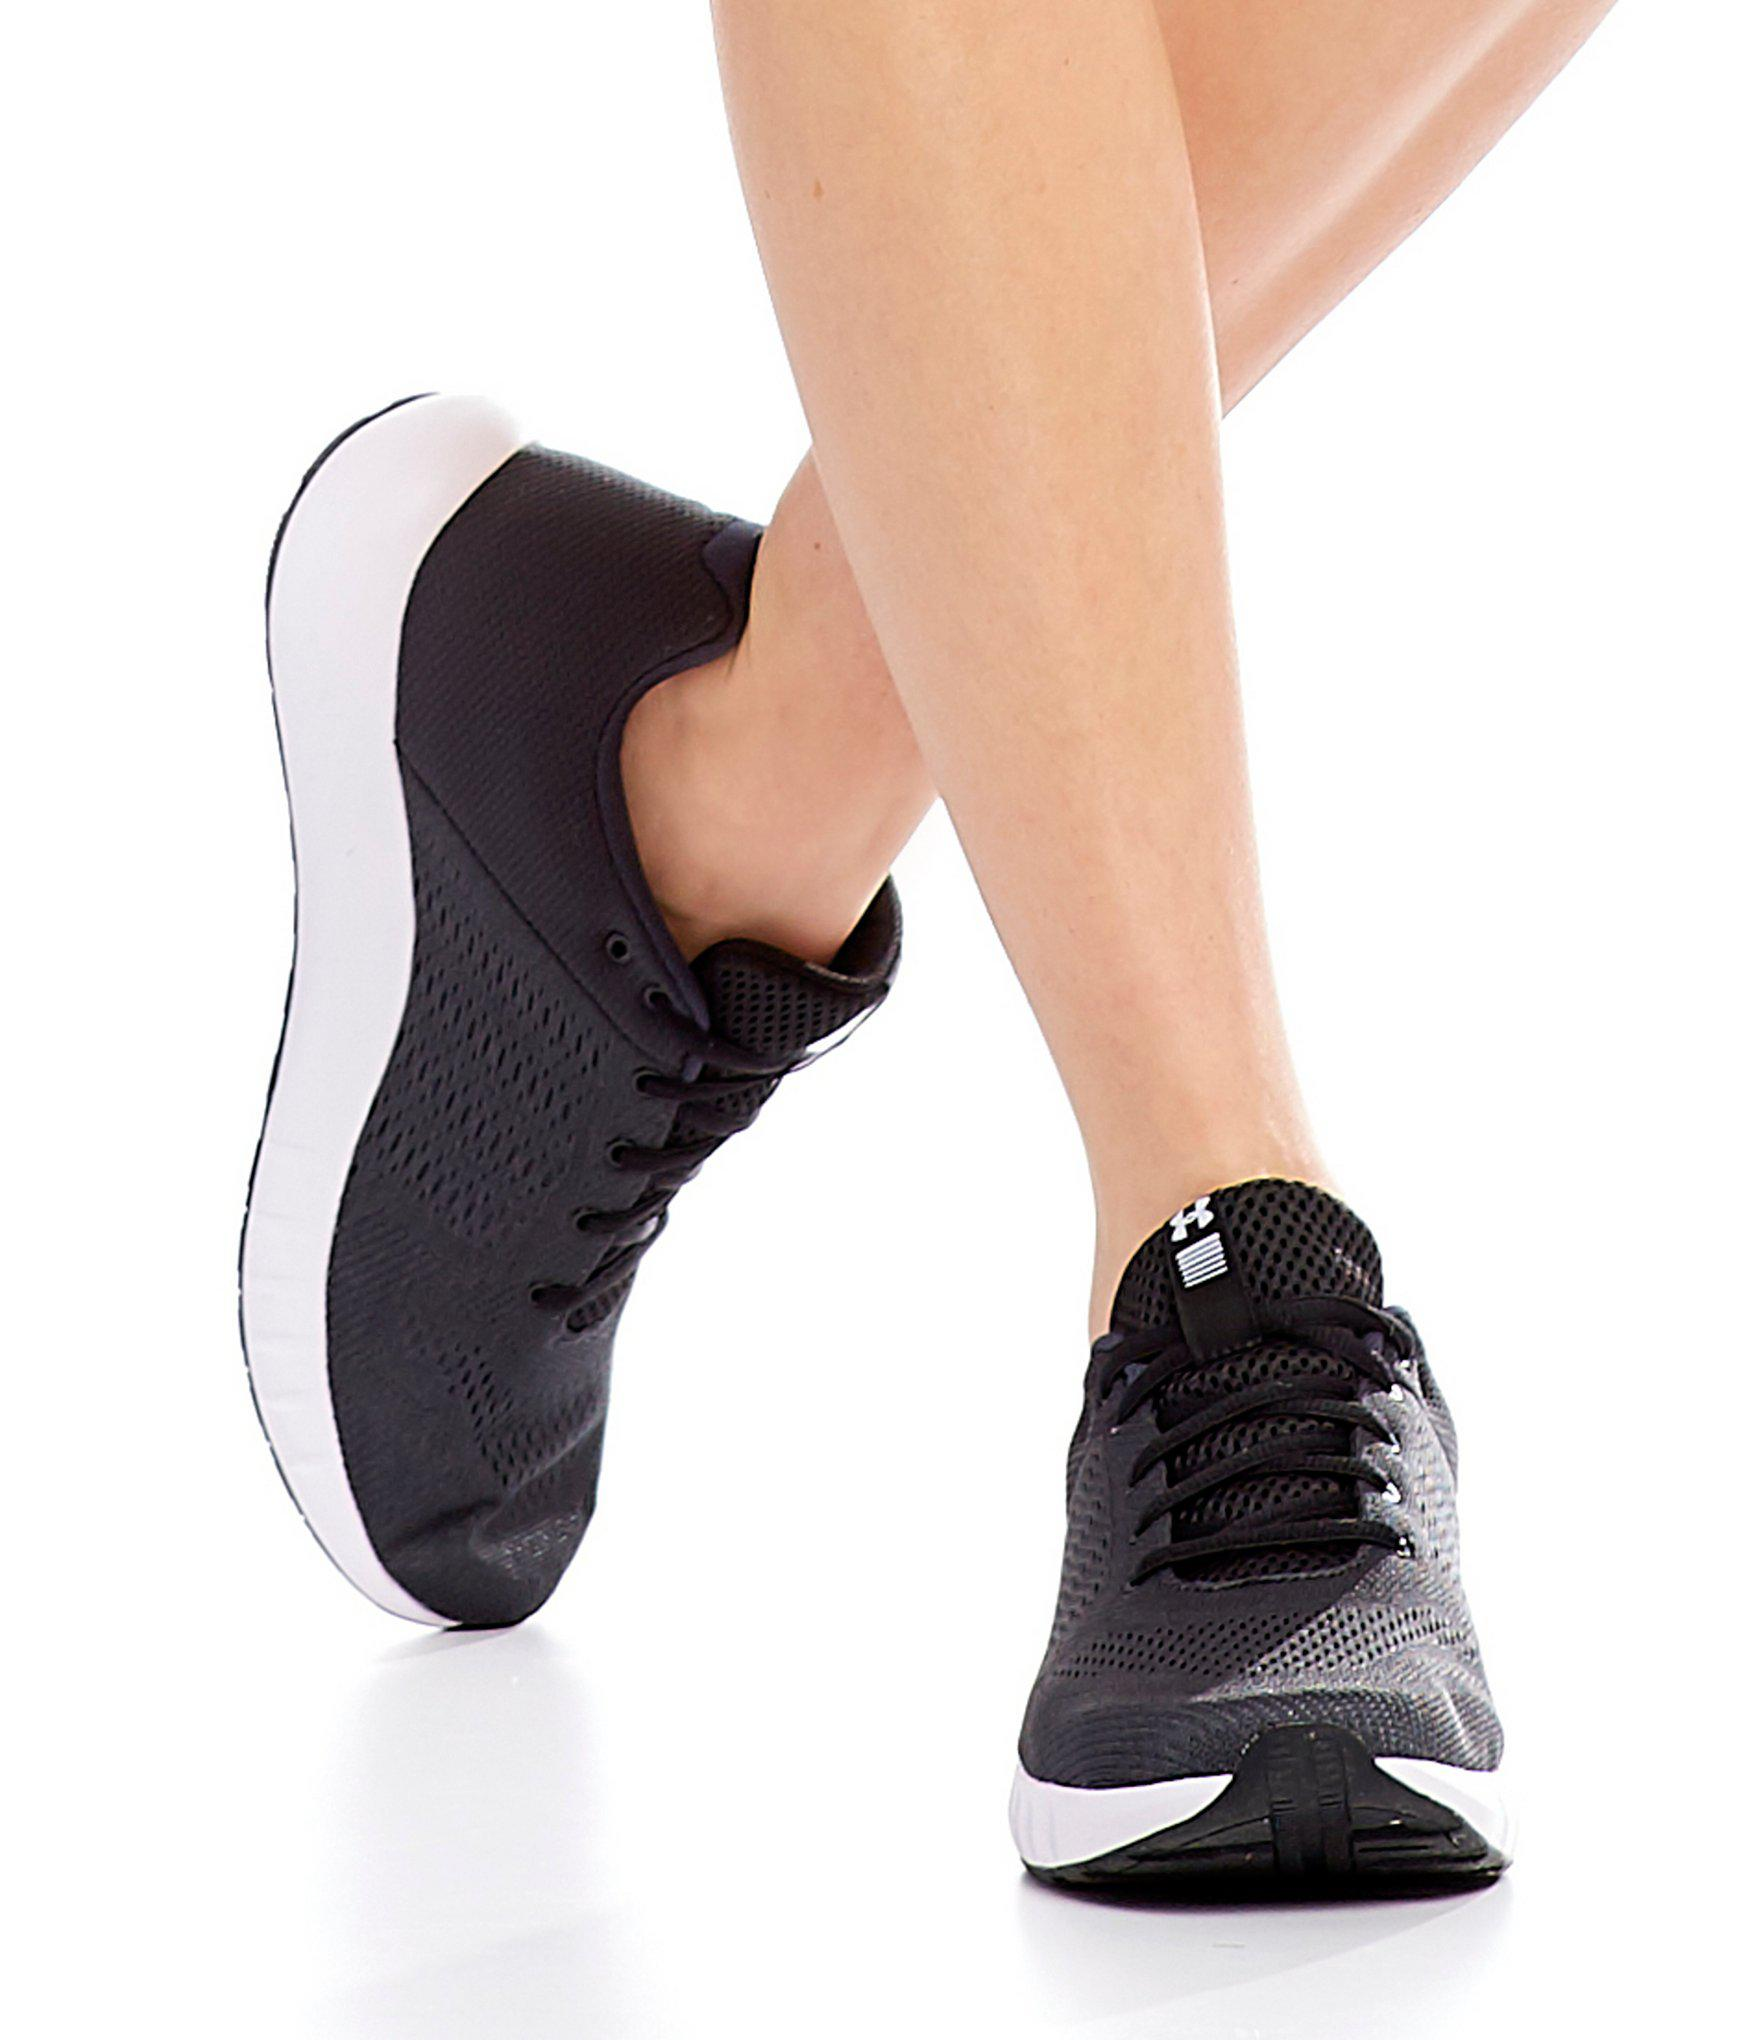 1dda3afbf50ac Under Armour Black Women's Micro G Pursuit Sneakers